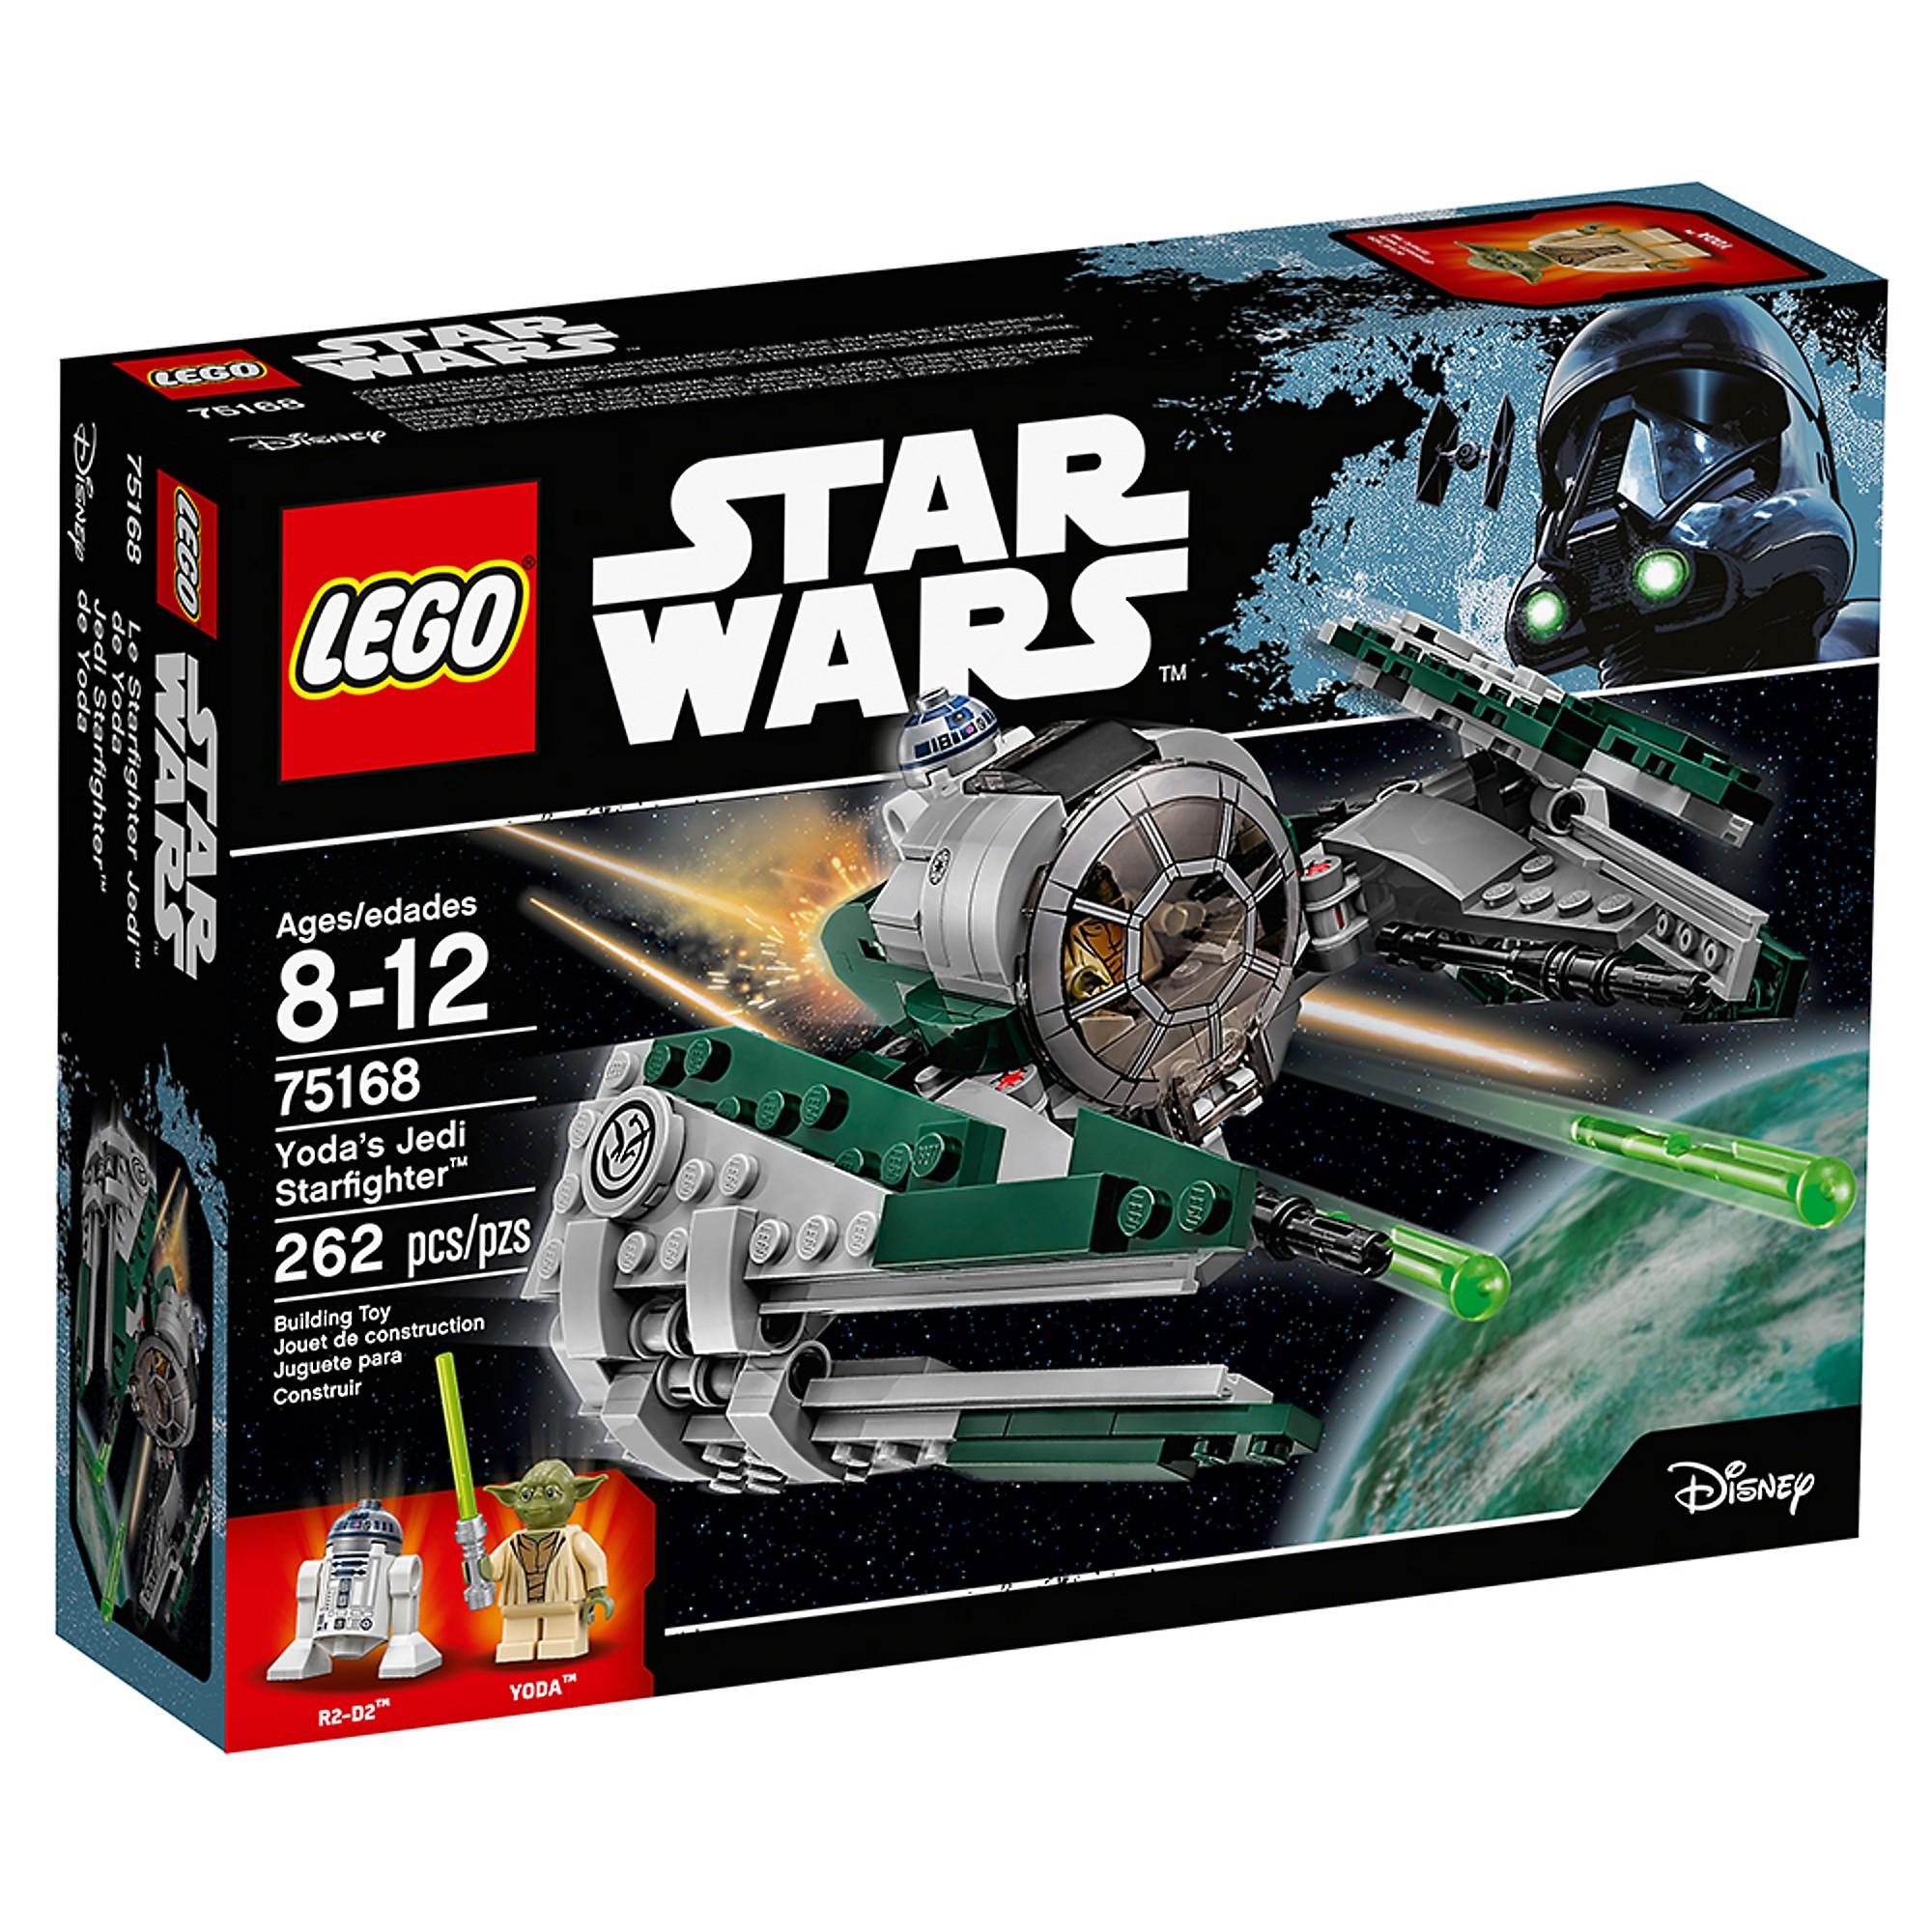 Lego 75168 Yodas Jedi Starfighter Nsapaz7929 Lego Complete Sets